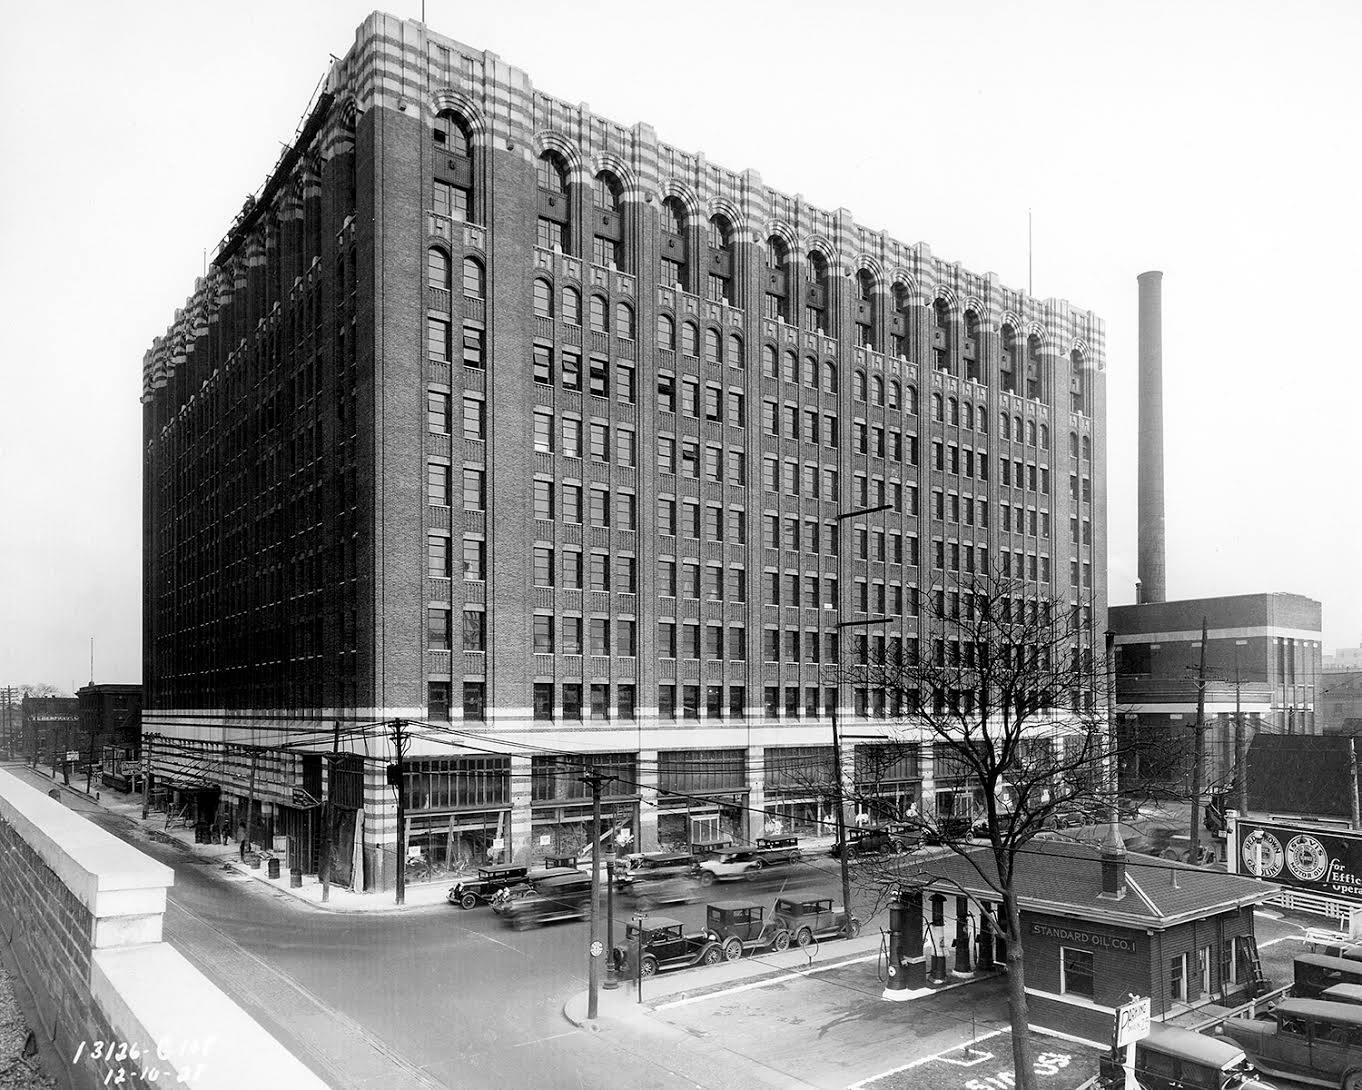 The Argonaut Building, Detroit, MI. 85 years ago. #TBT #ThrowBackThursday #Detroit #History http://t.co/wDbAcuRogy